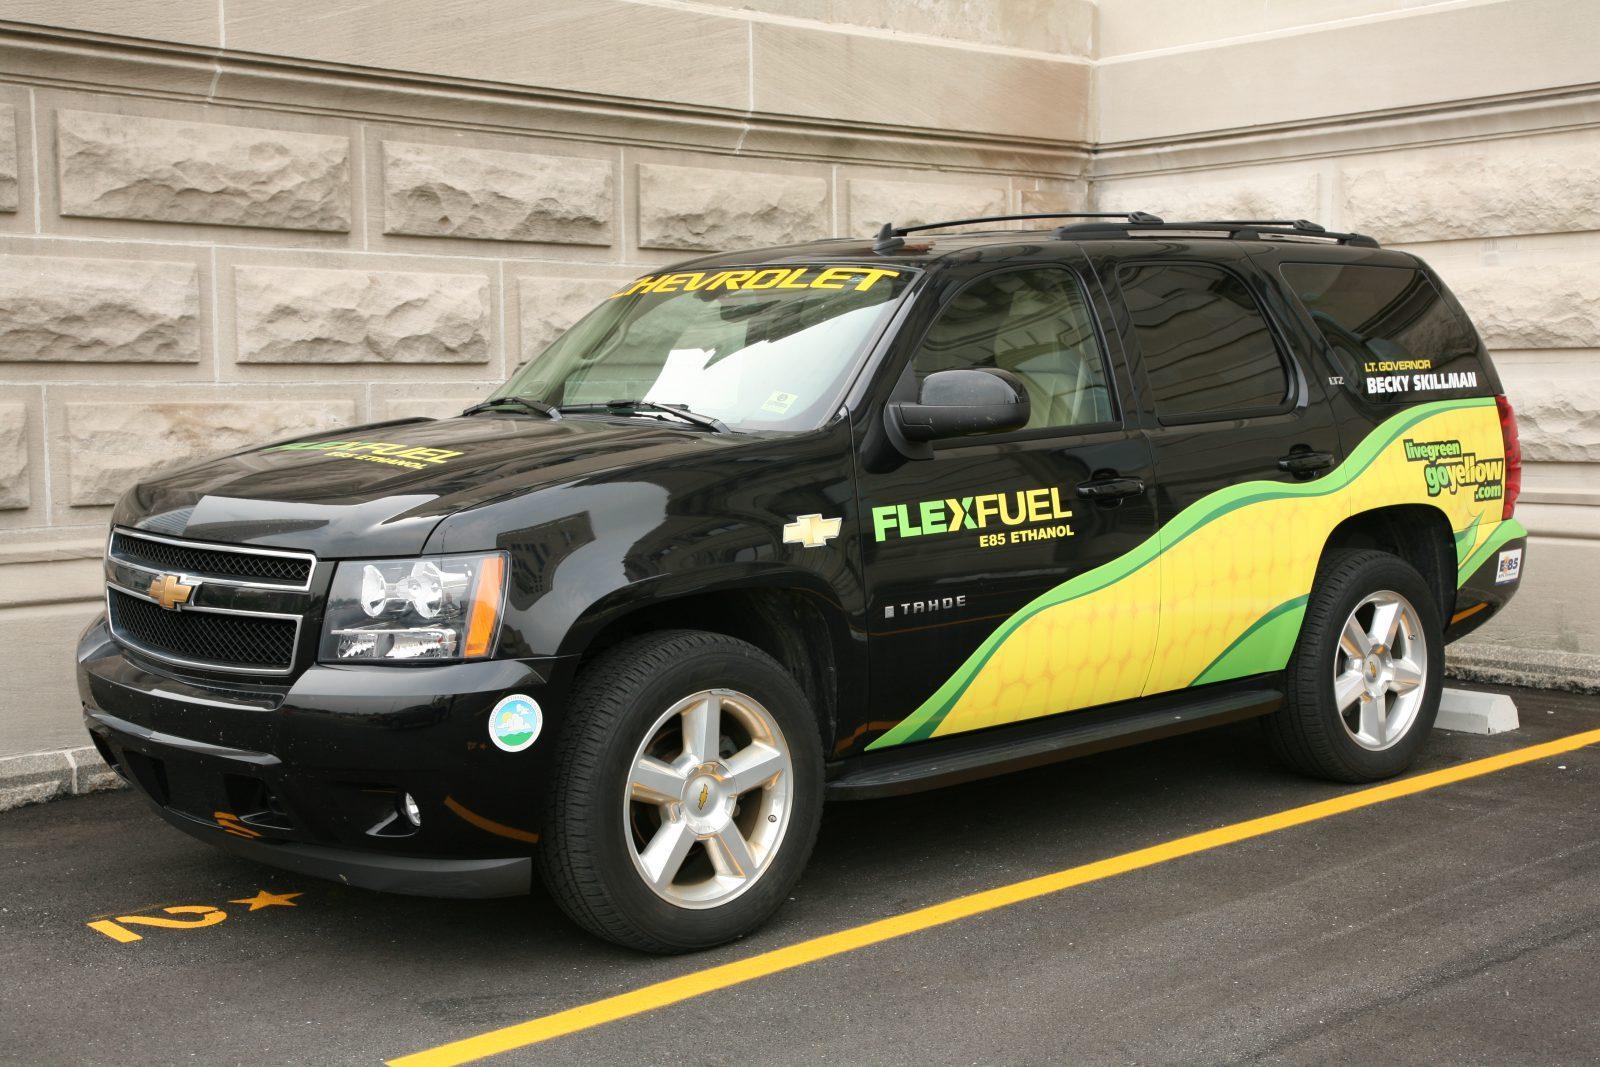 Autos Flex Fuel >> A Short List Of Pros And Cons Of Flex Fuel Car From Japan